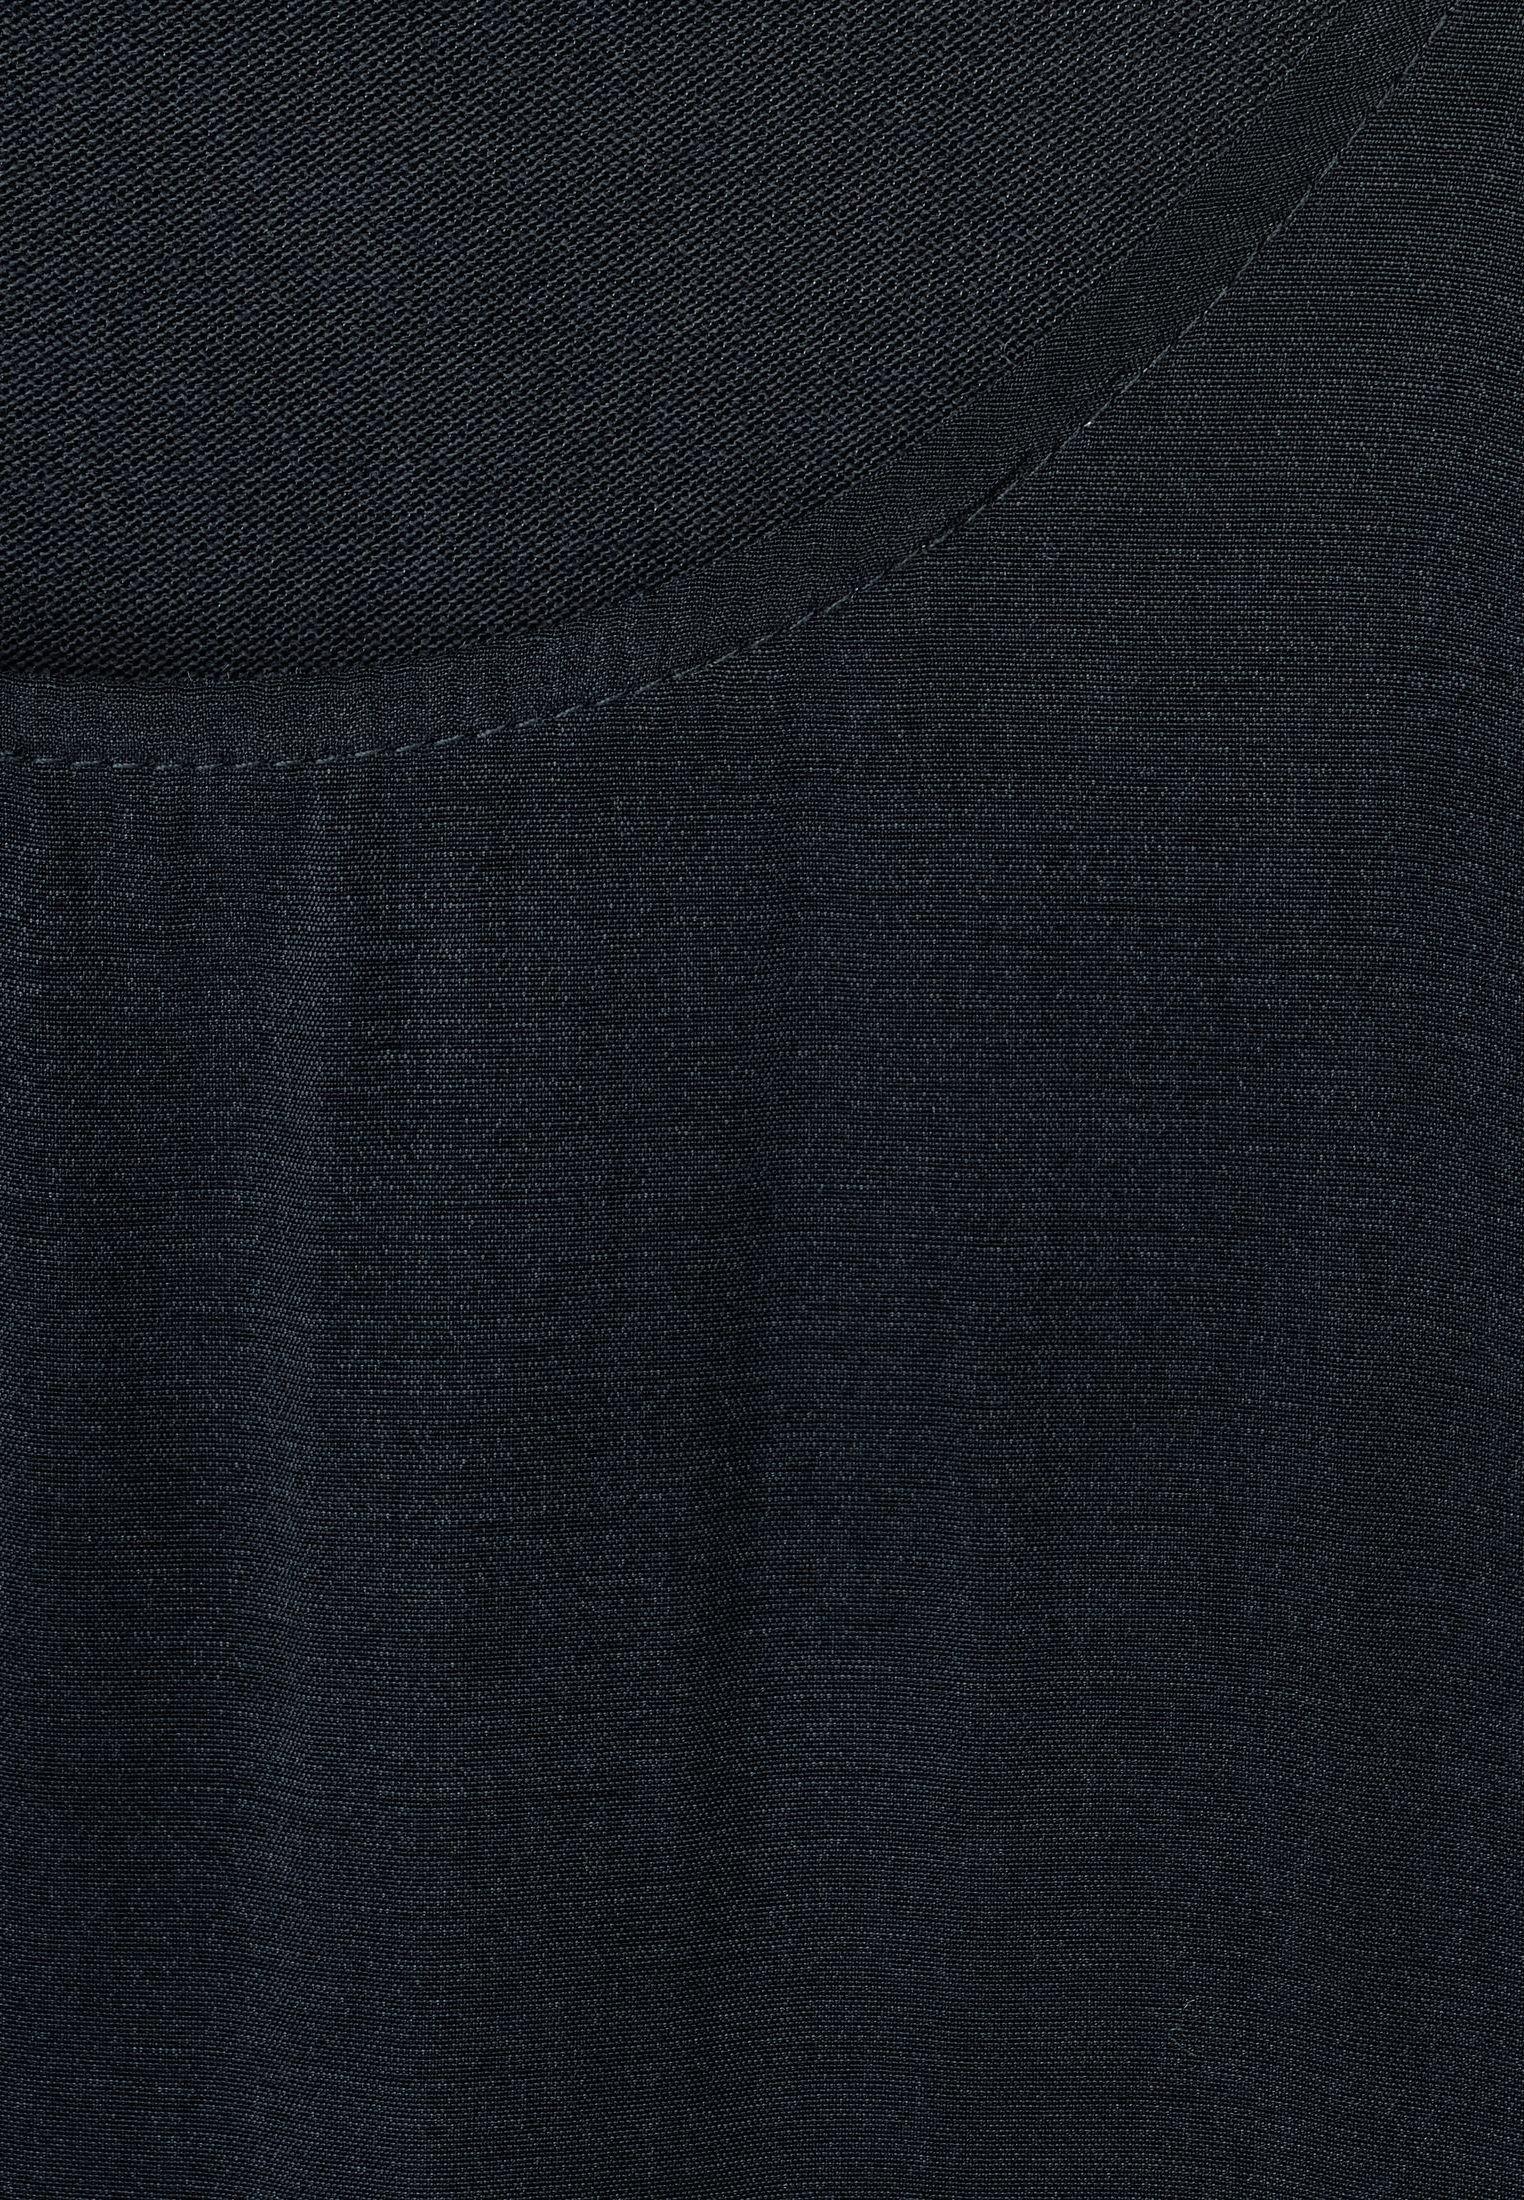 Street One Mit Saum-detail - Long Sleeved Top Dark Grey